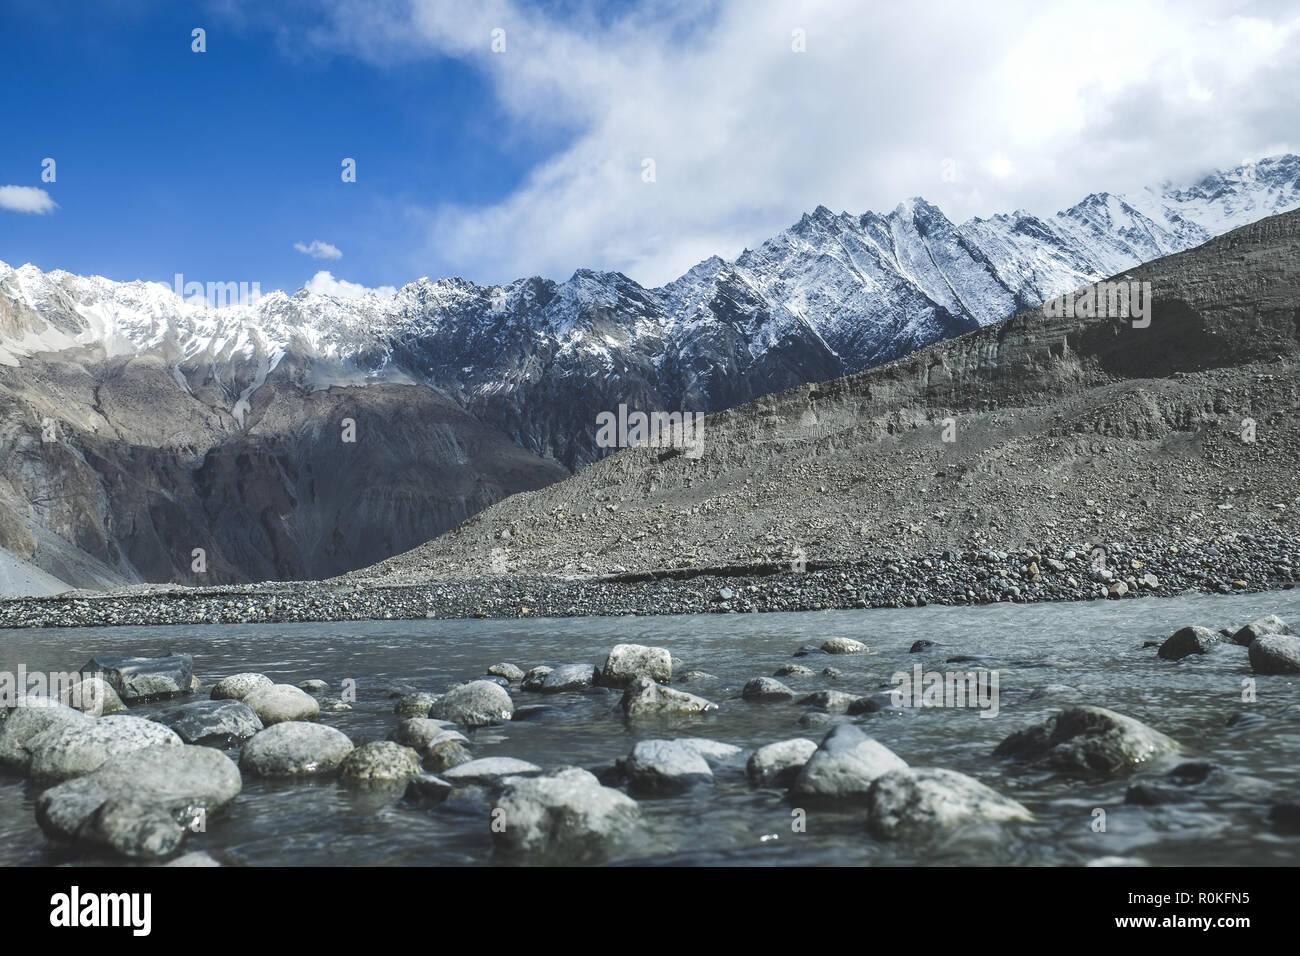 Flowing water stream among snow capped mountains in Karakoram range. - Stock Image